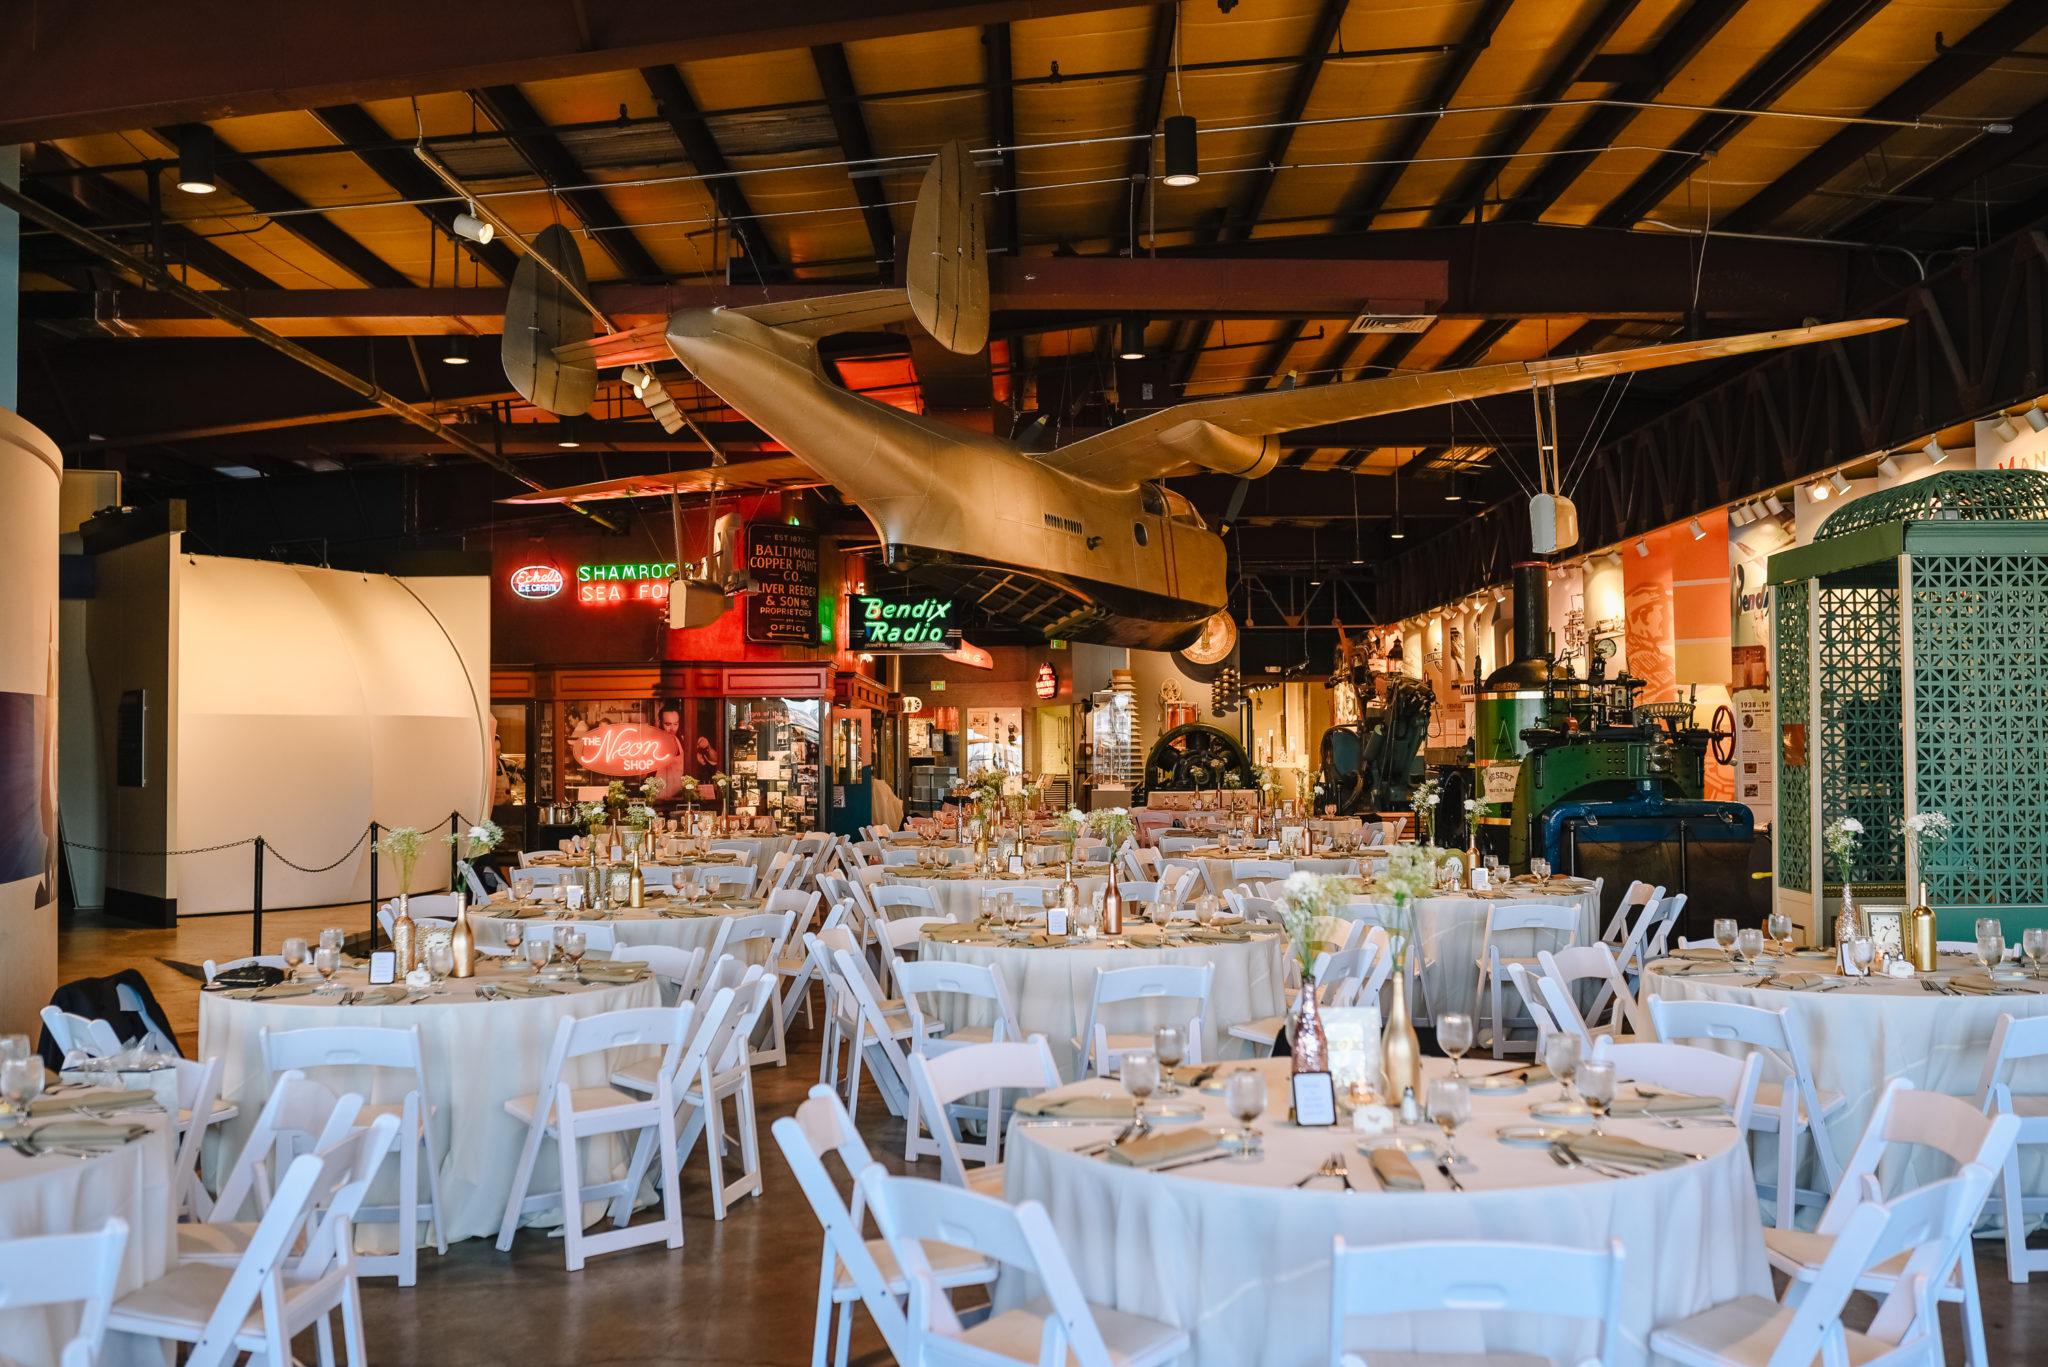 Baltimore-Musuem-of-Industry-wedding-nicole-barr-16